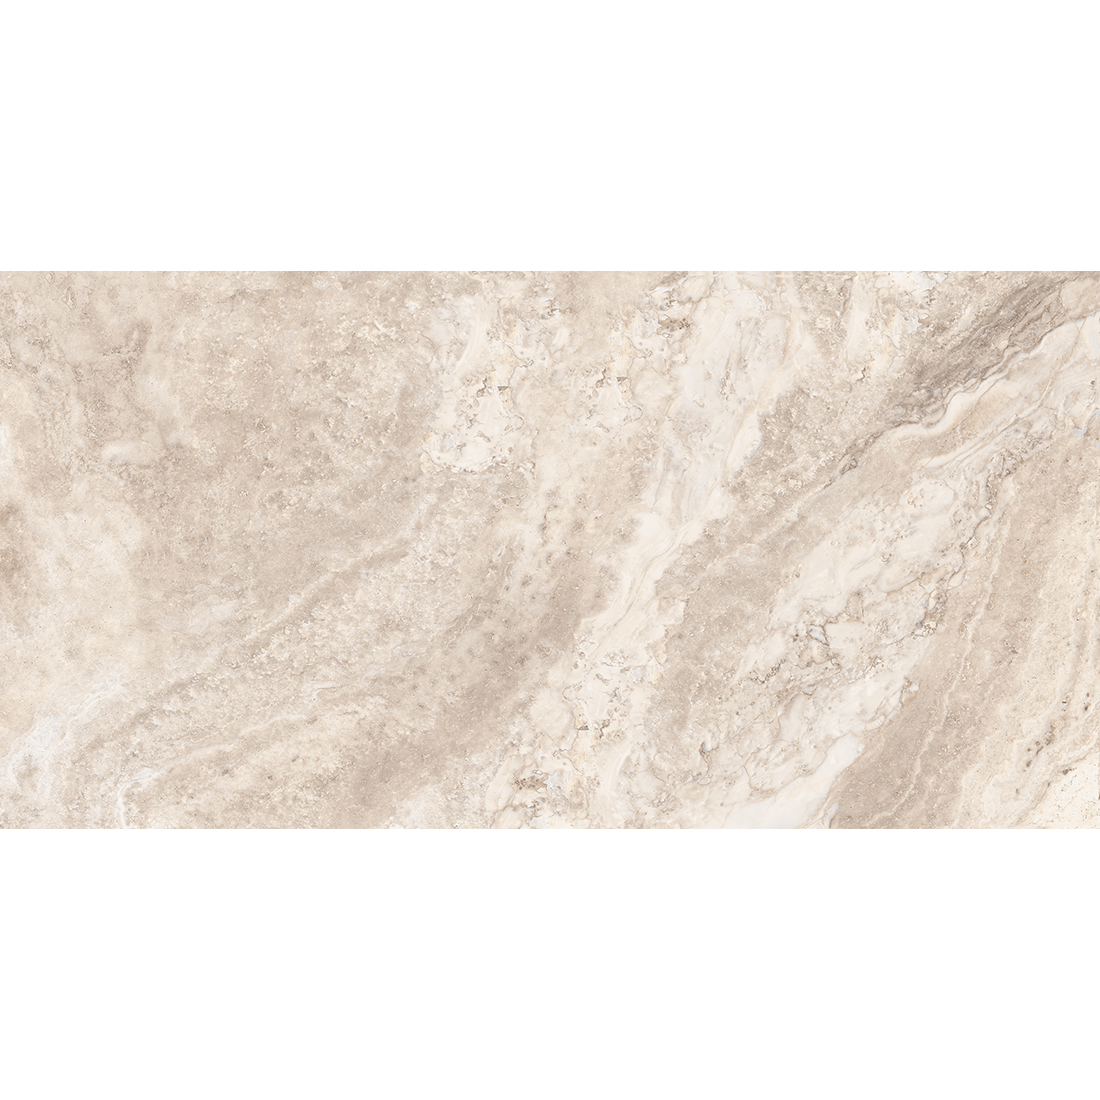 Alabastrino 30x60 Beige Gloss 1